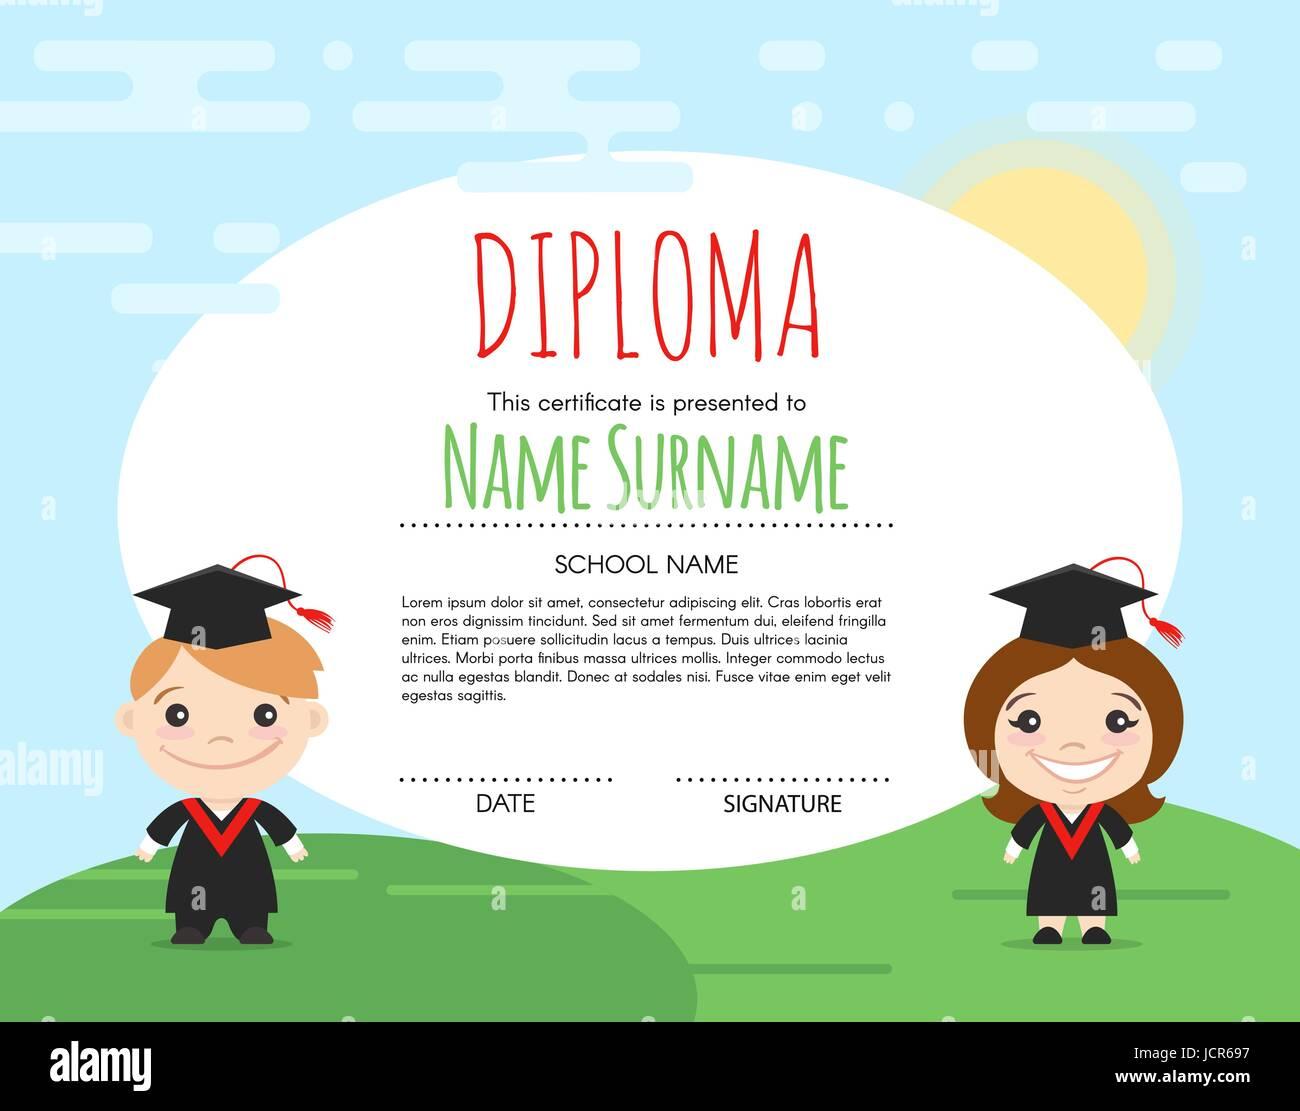 Template School Diploma Children Stockfotos & Template School ...